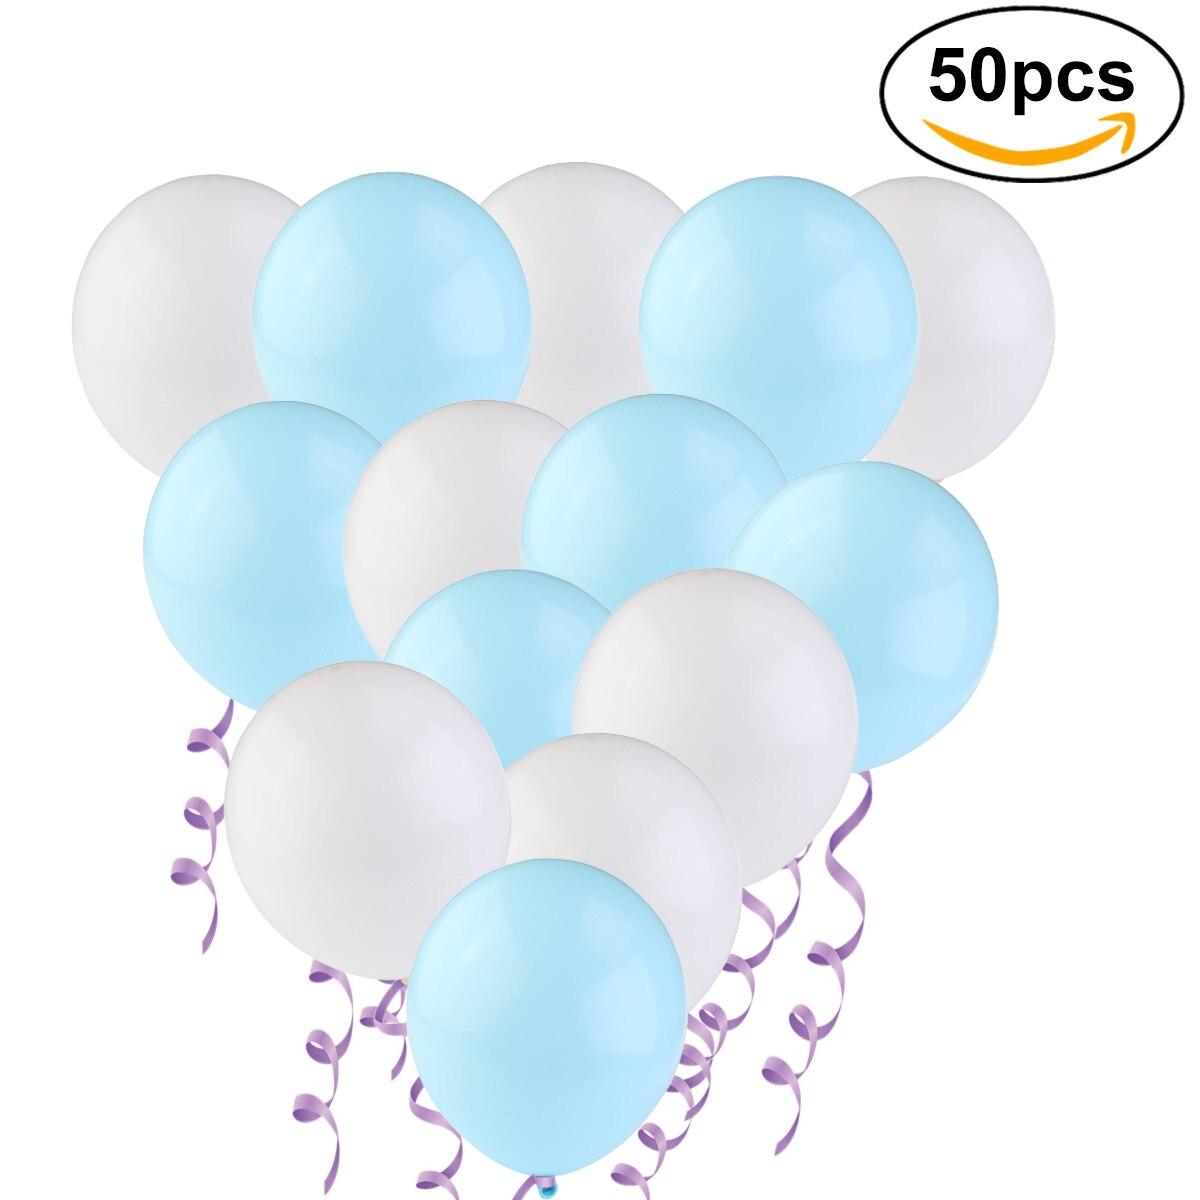 50 Metallic Balloons Each 25 X White And Light Blue Party Balloons ...